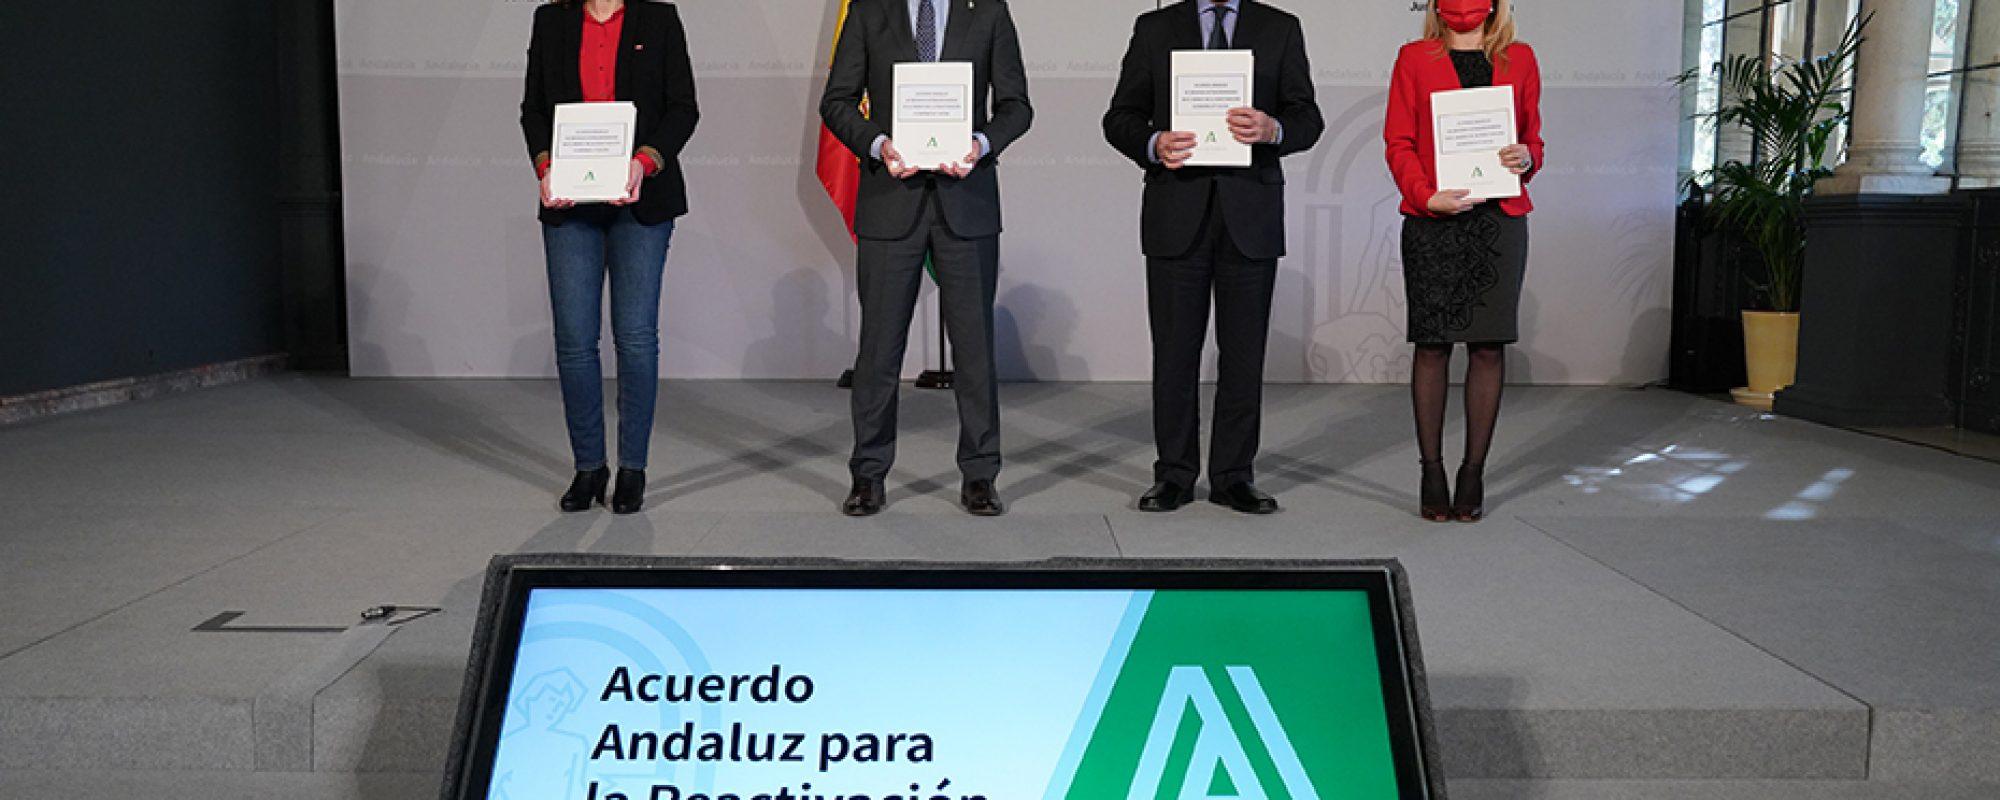 ACUERDO DE DS EN ANDALUCÍA